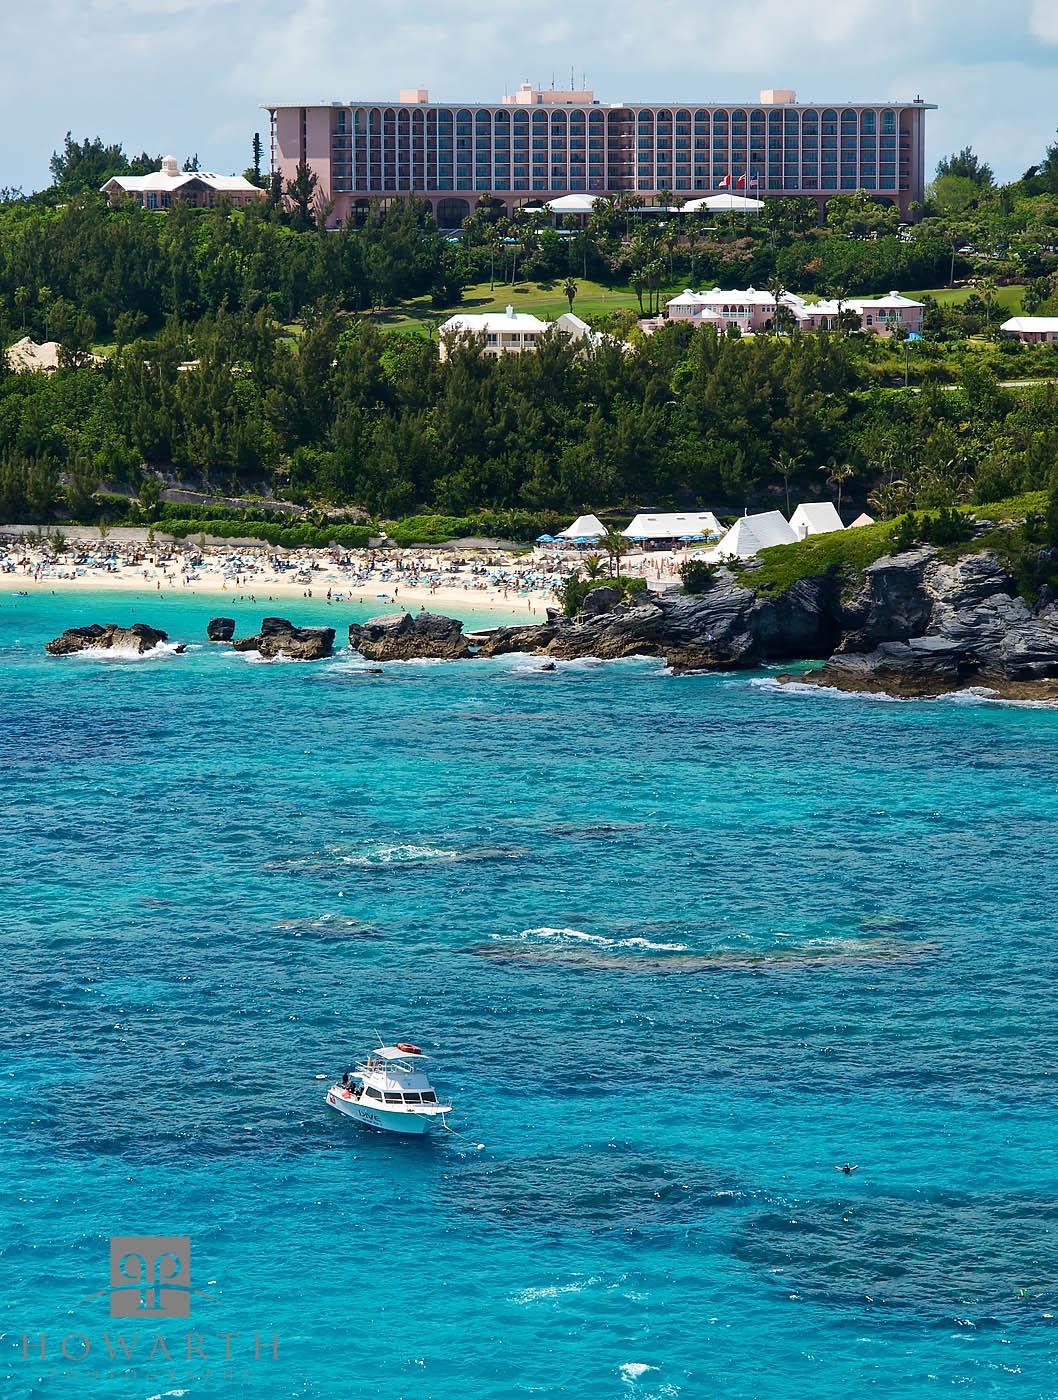 SCUBA Dive Bermuda off the Fairmont Beach